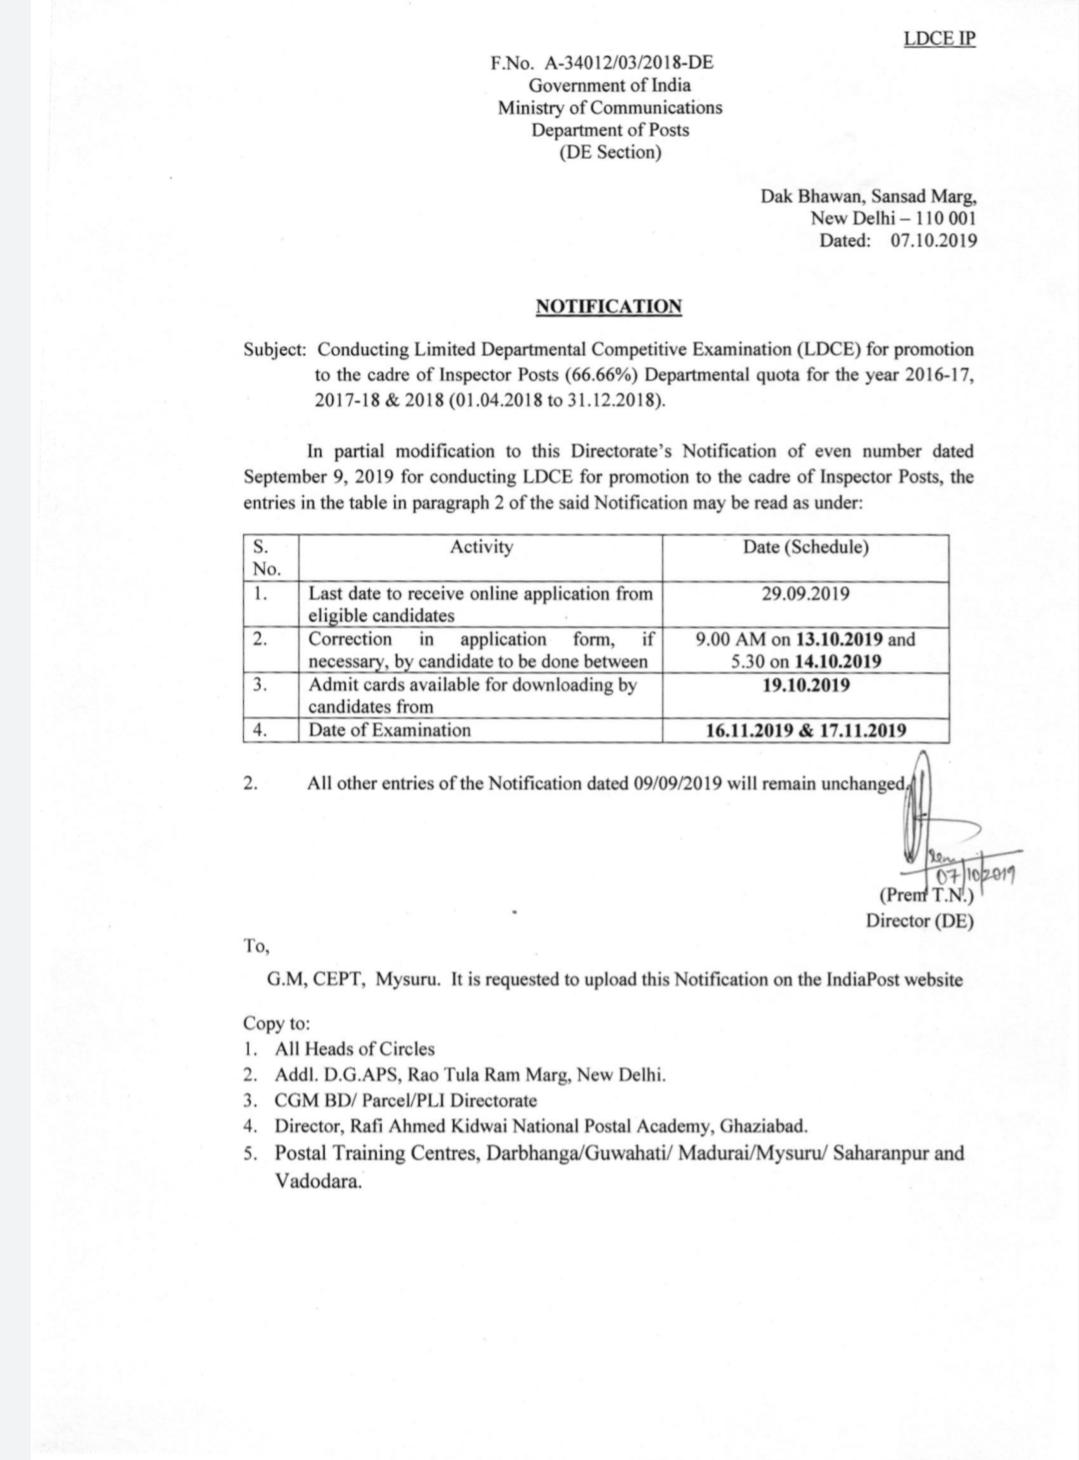 Change of IPO exam date